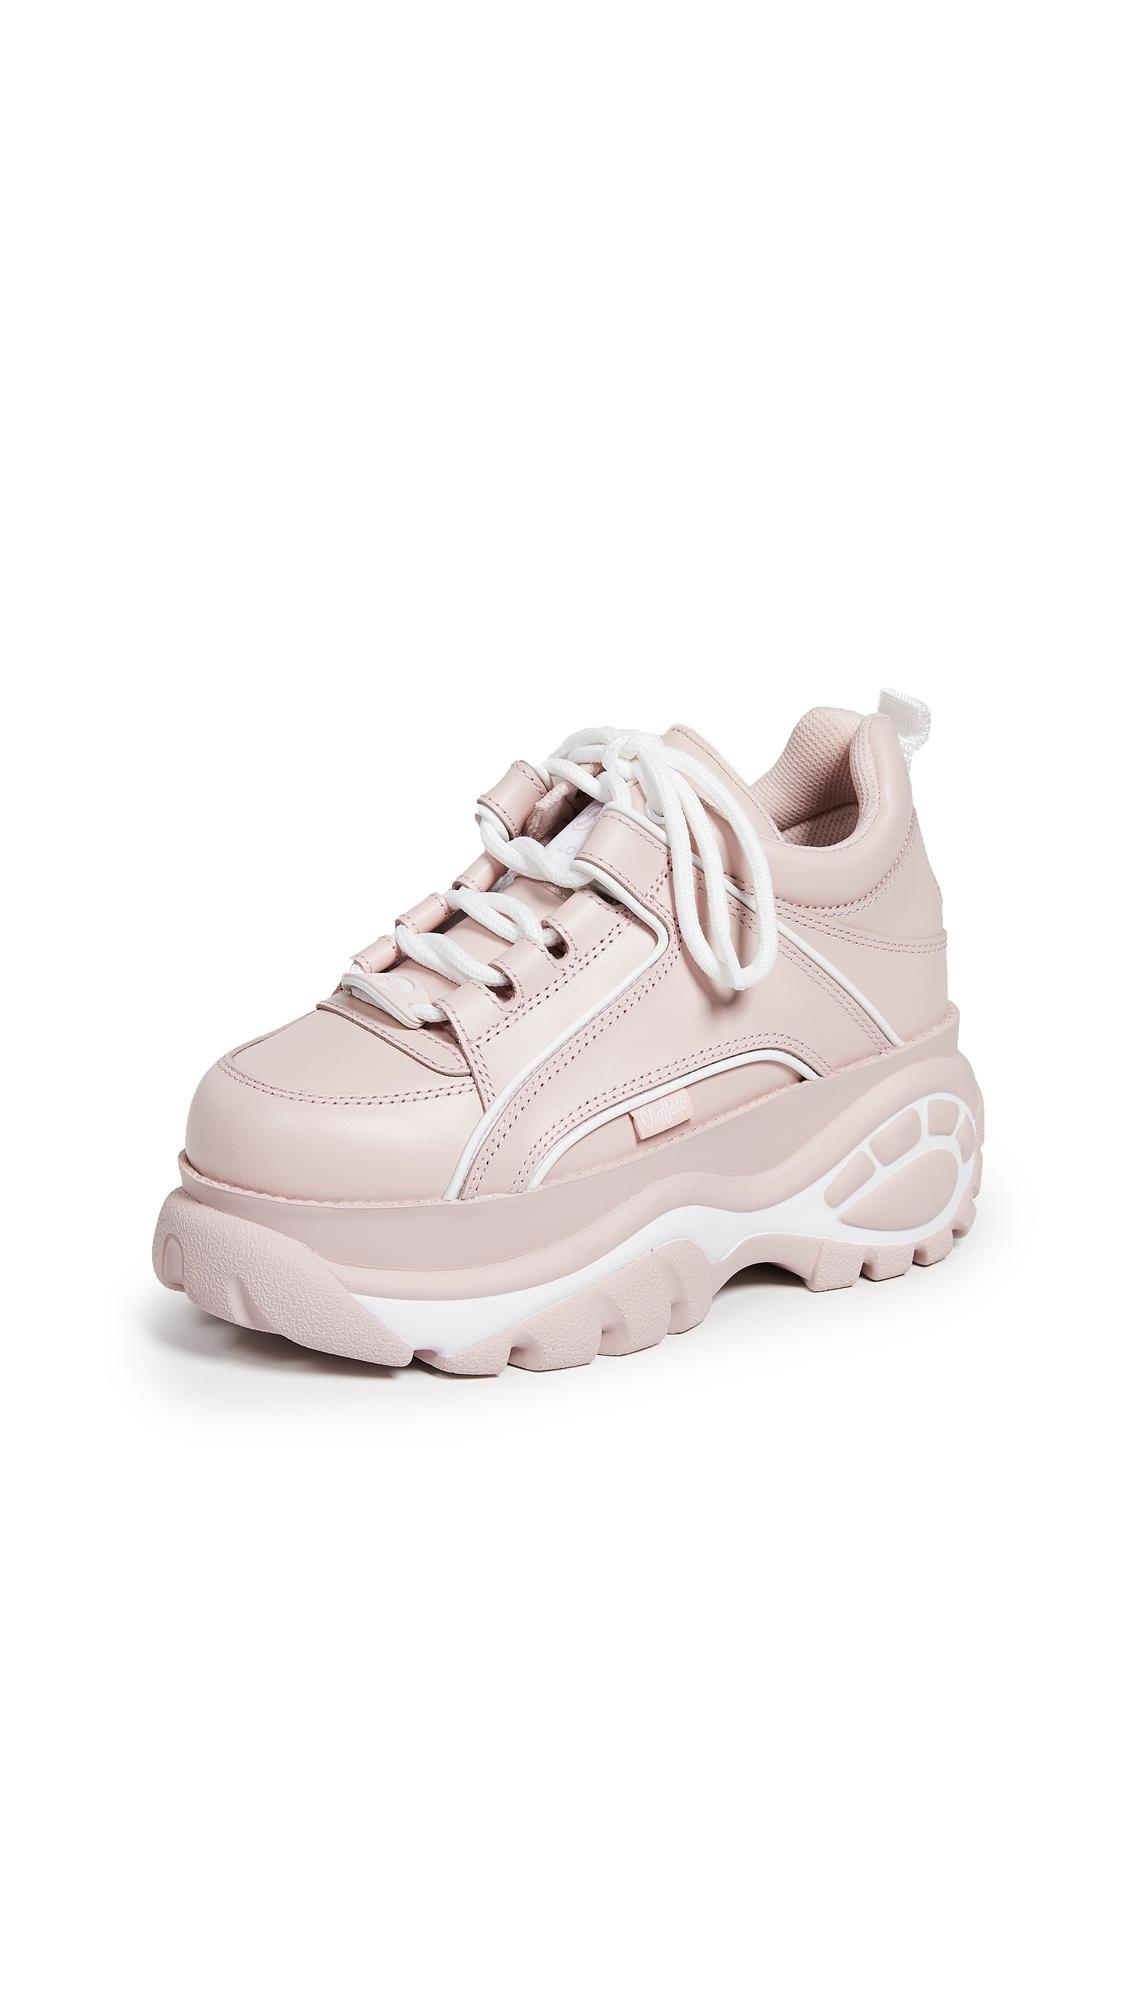 Buffalo London Classic Kicks Sneakers - Baby Pink